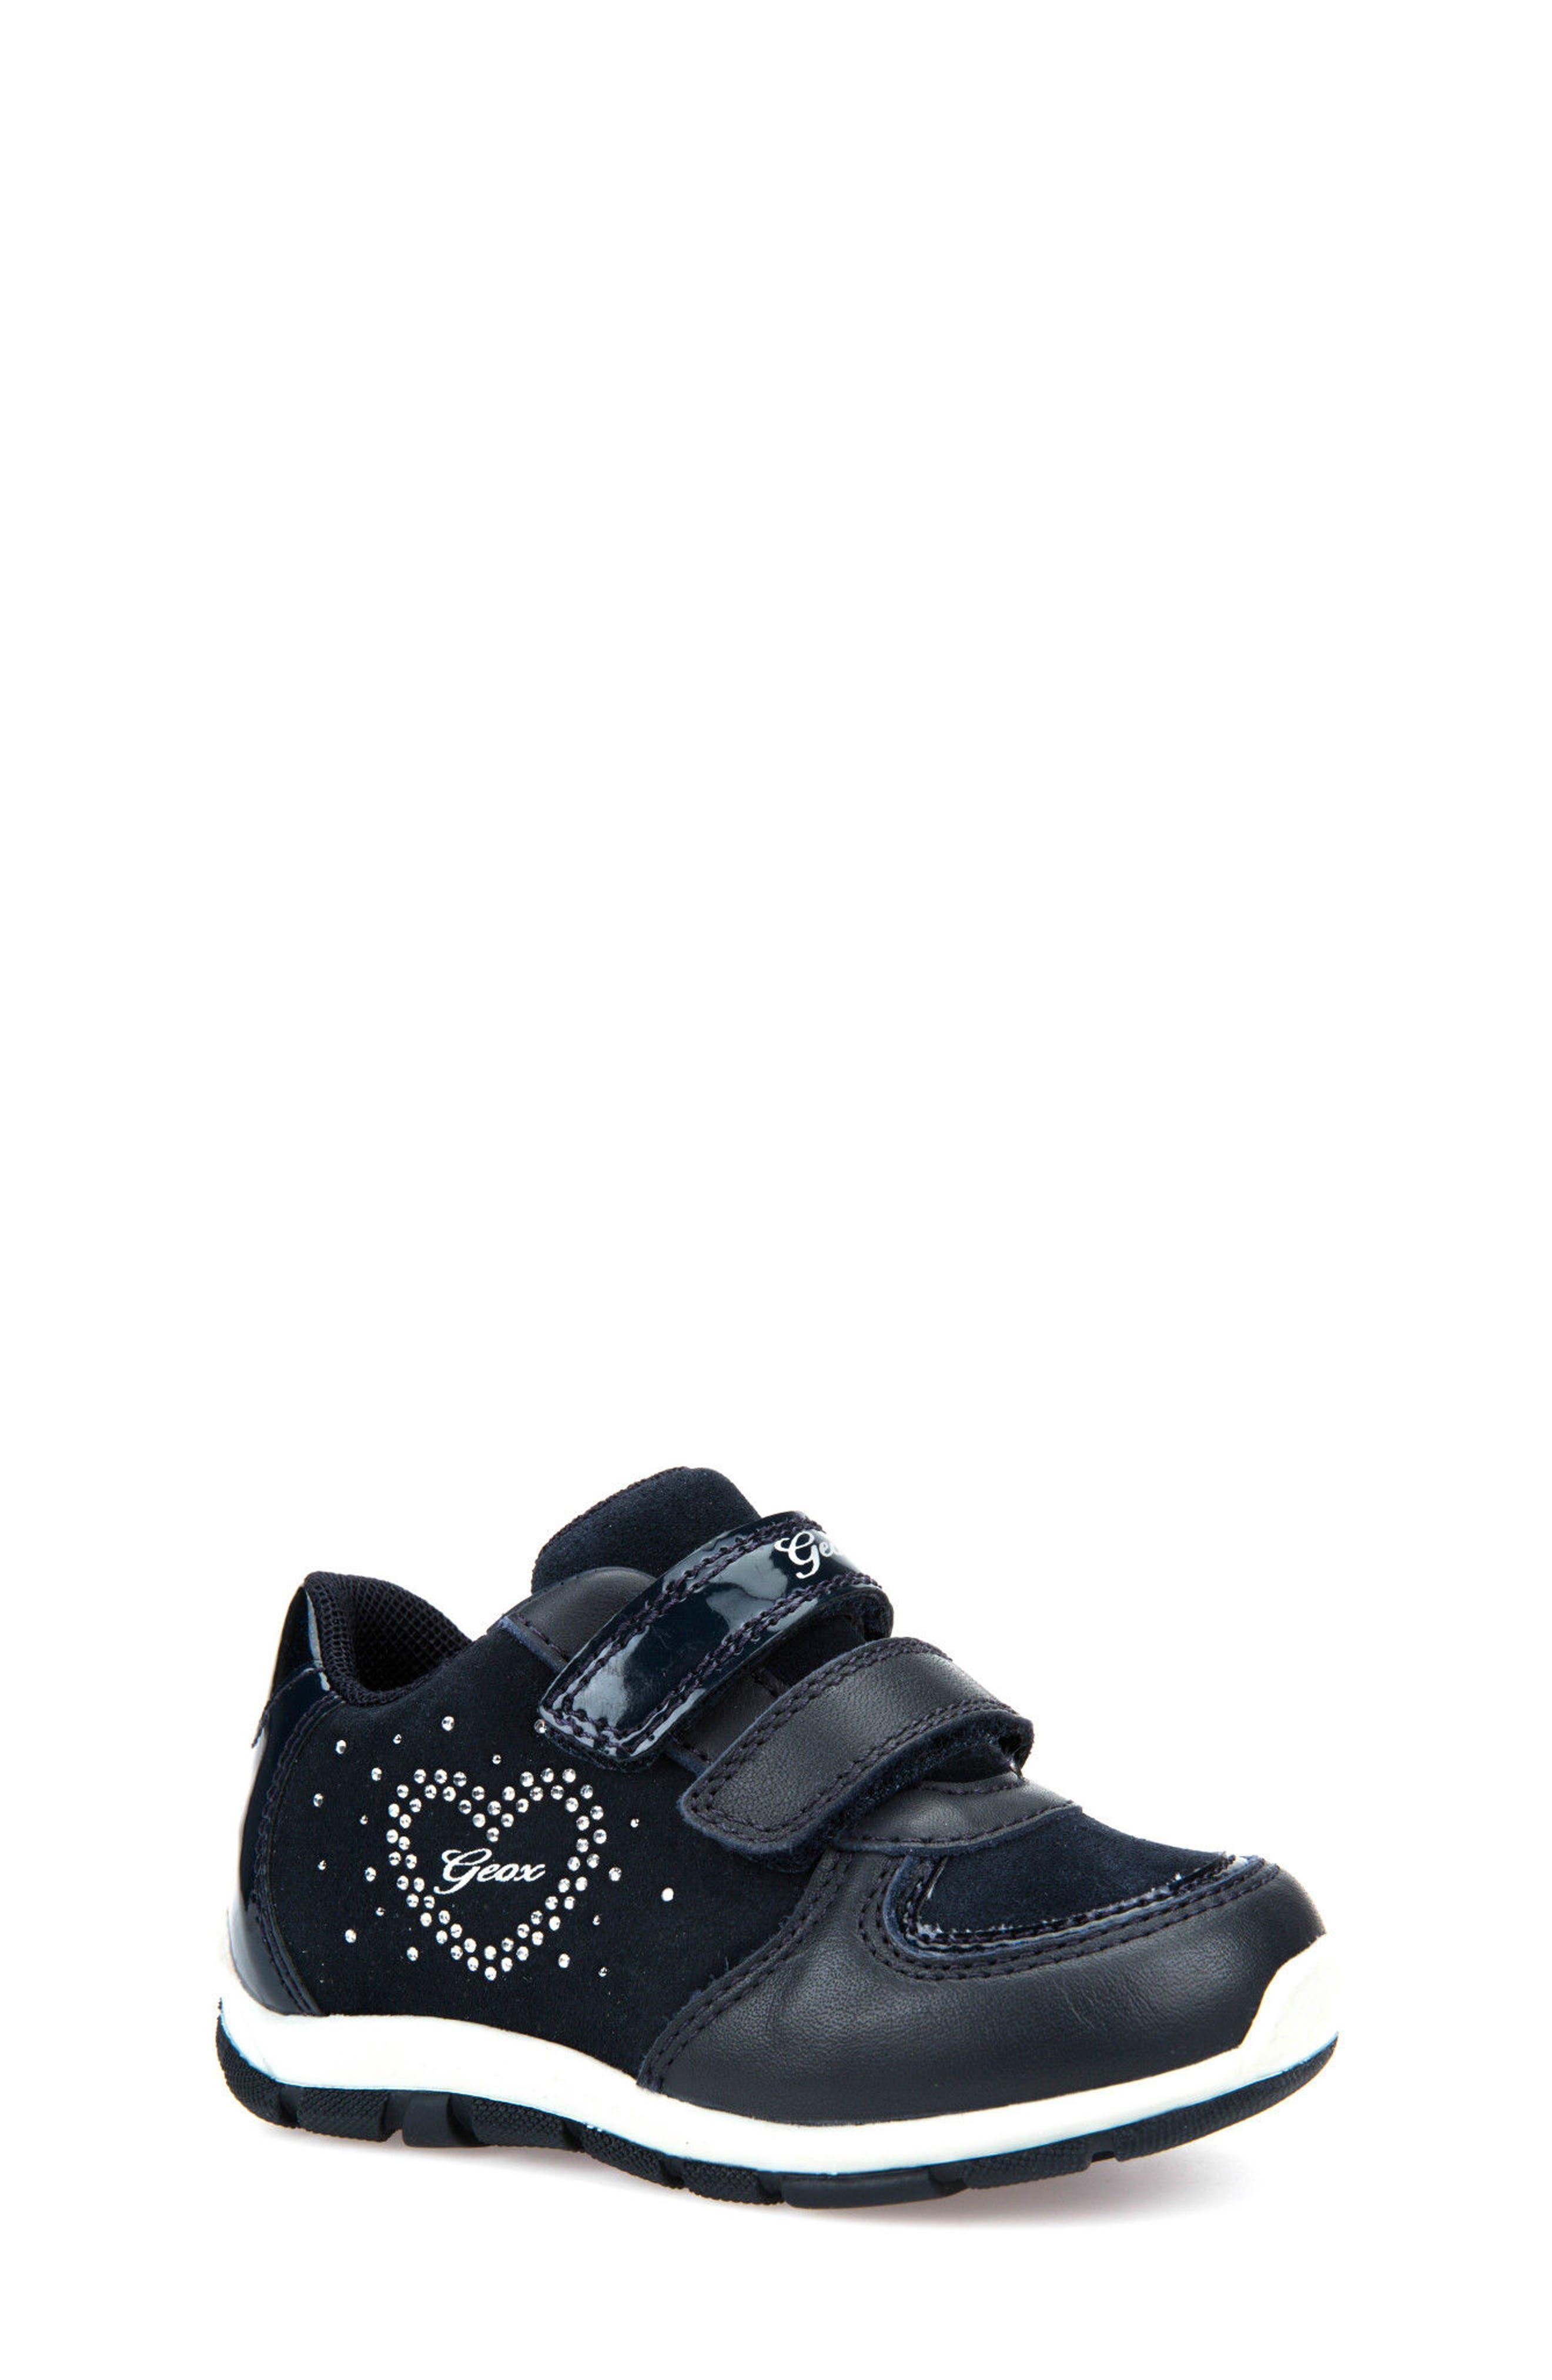 Shaax Love Sneaker,                         Main,                         color, 410